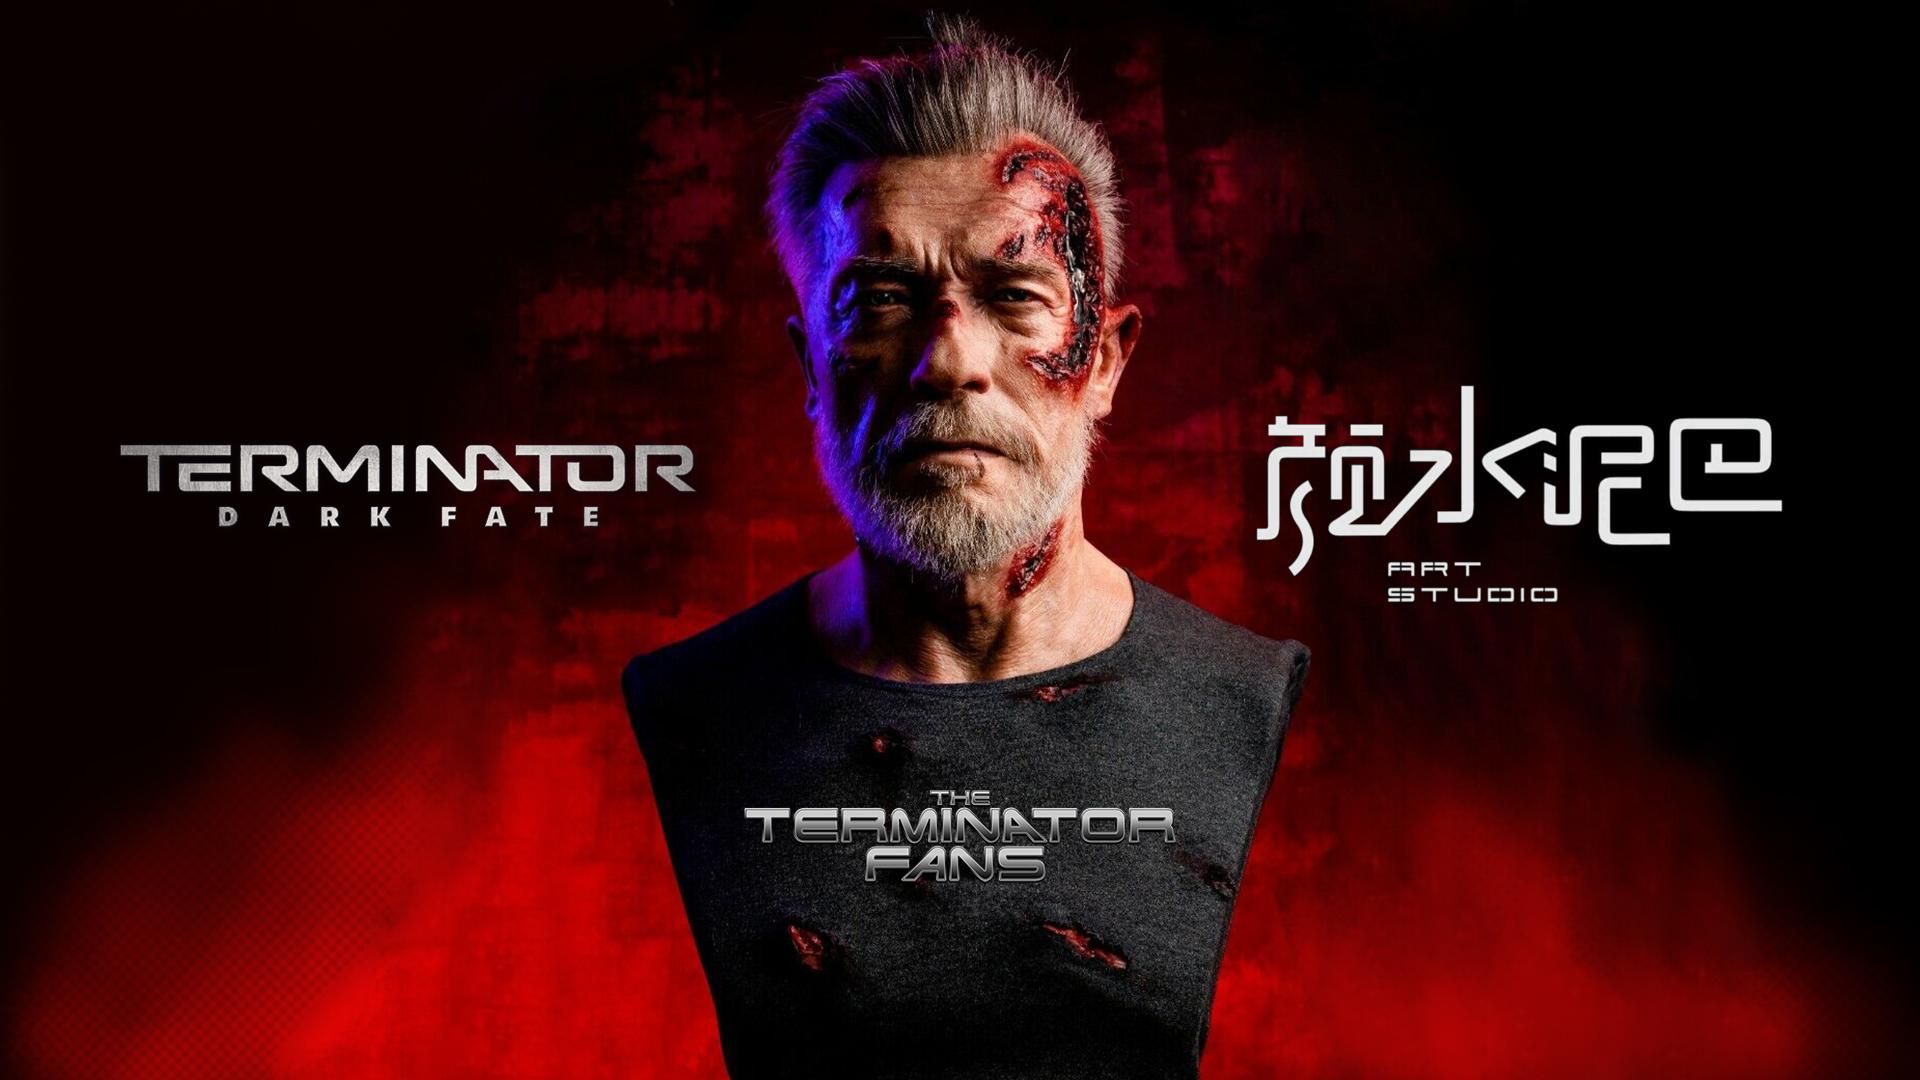 Art Studio Terminator: Dark Fate - Arnold Schwarzenegger Bust